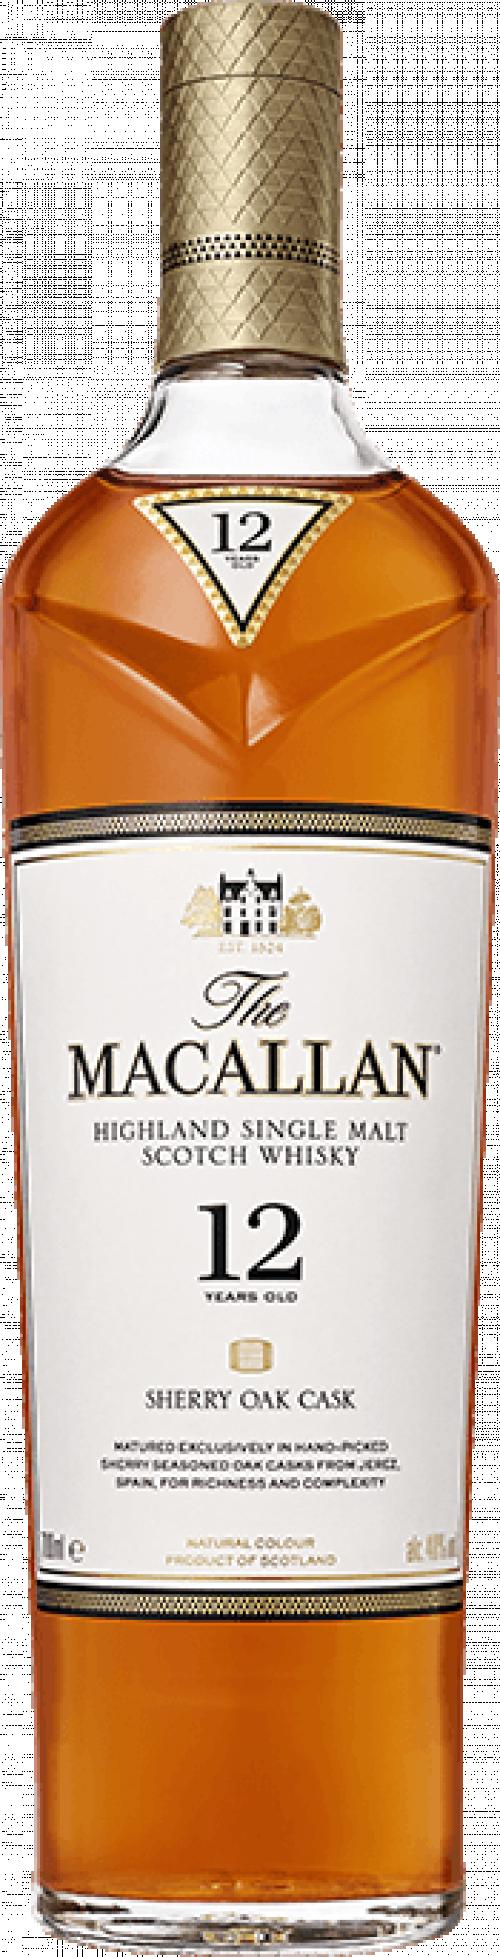 Macallan 12Yr Single Malt Scotch Whisky 750ml